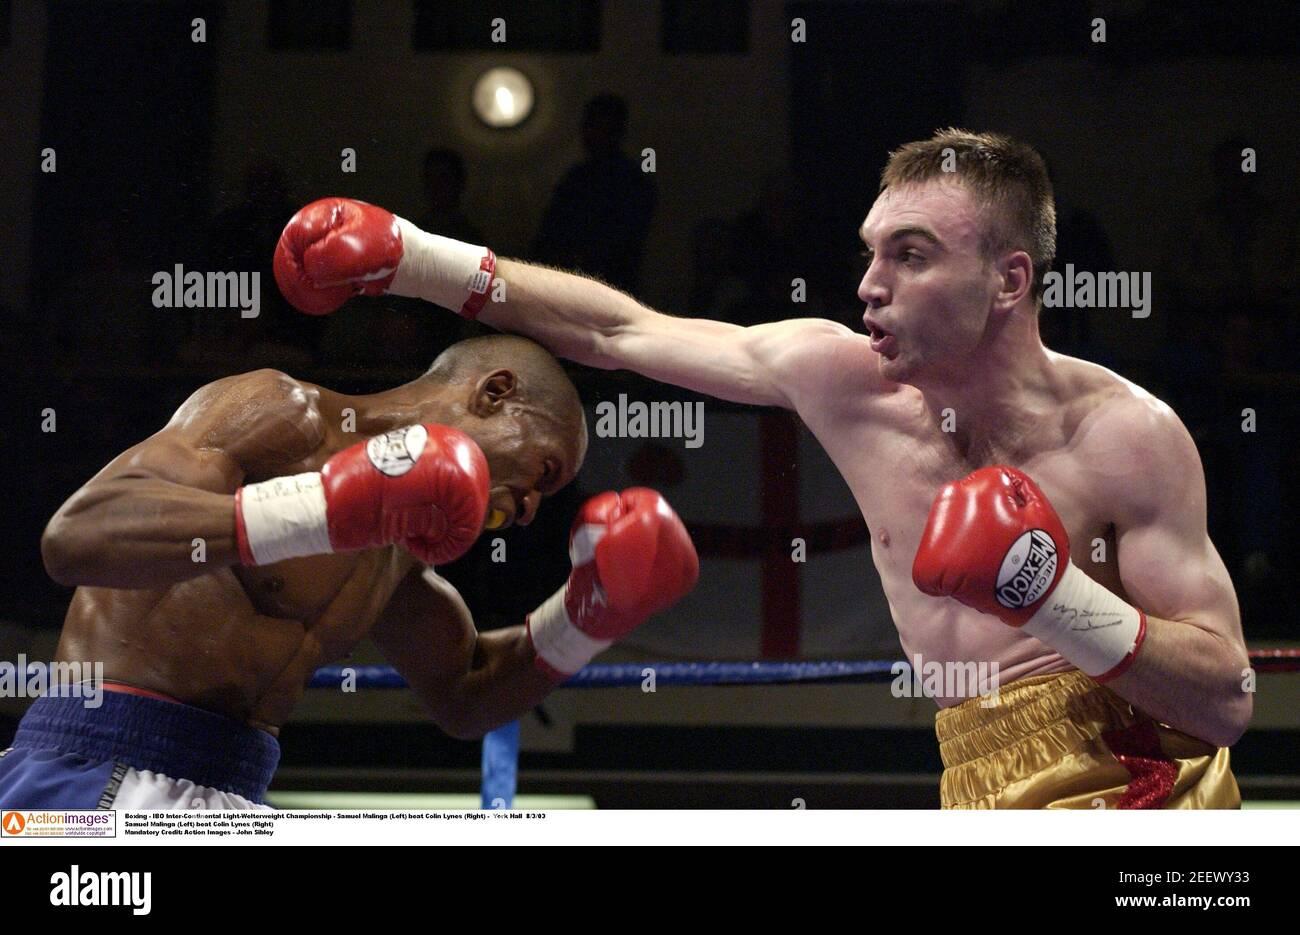 Boxing - IBO Inter-Continental Light-Welterweight Championship - Samuel Malinga (Left) beat Colin Lynes (Right) -  York Hall  8/3/03  Samuel Malinga (Left) beat Colin Lynes (Right)  Mandatory Credit: Action Images - John Sibley Stock Photo